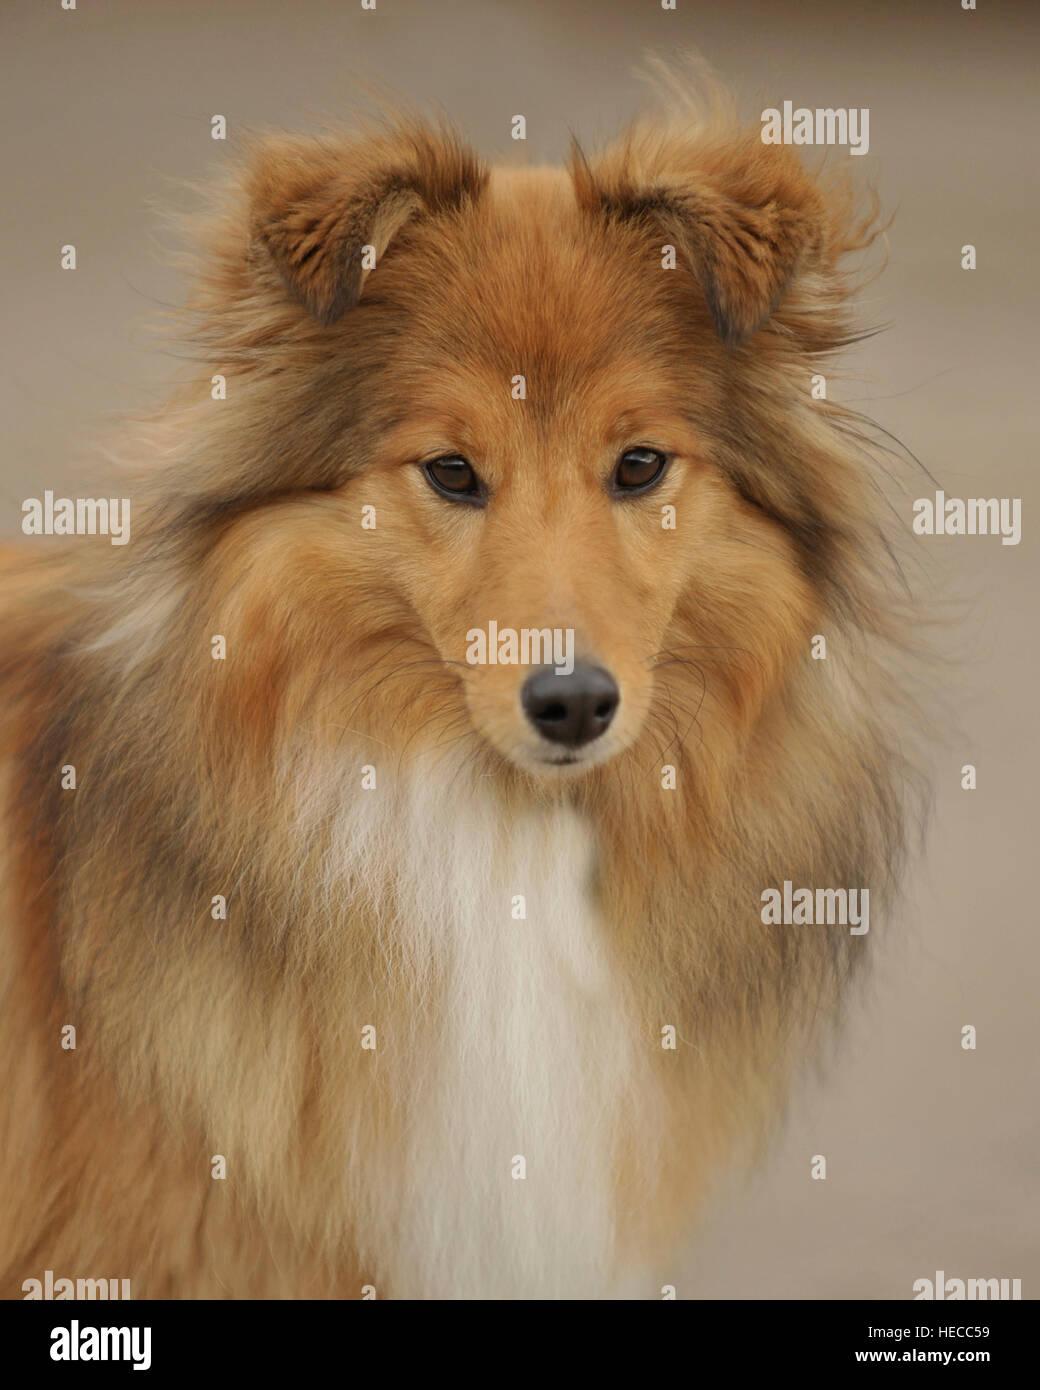 shetland sheepdog - Stock Image